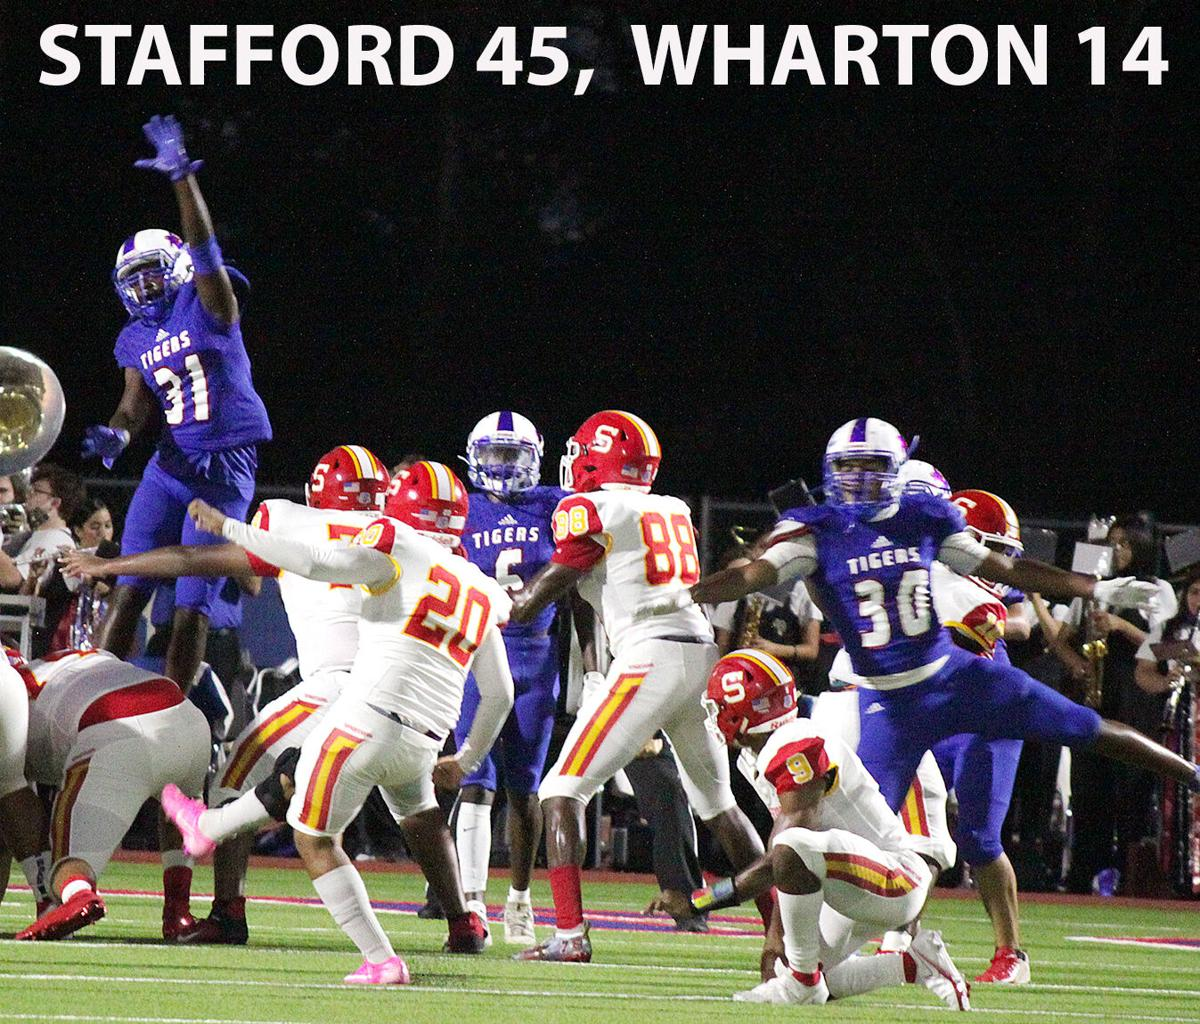 Wharton loses Homecoming game